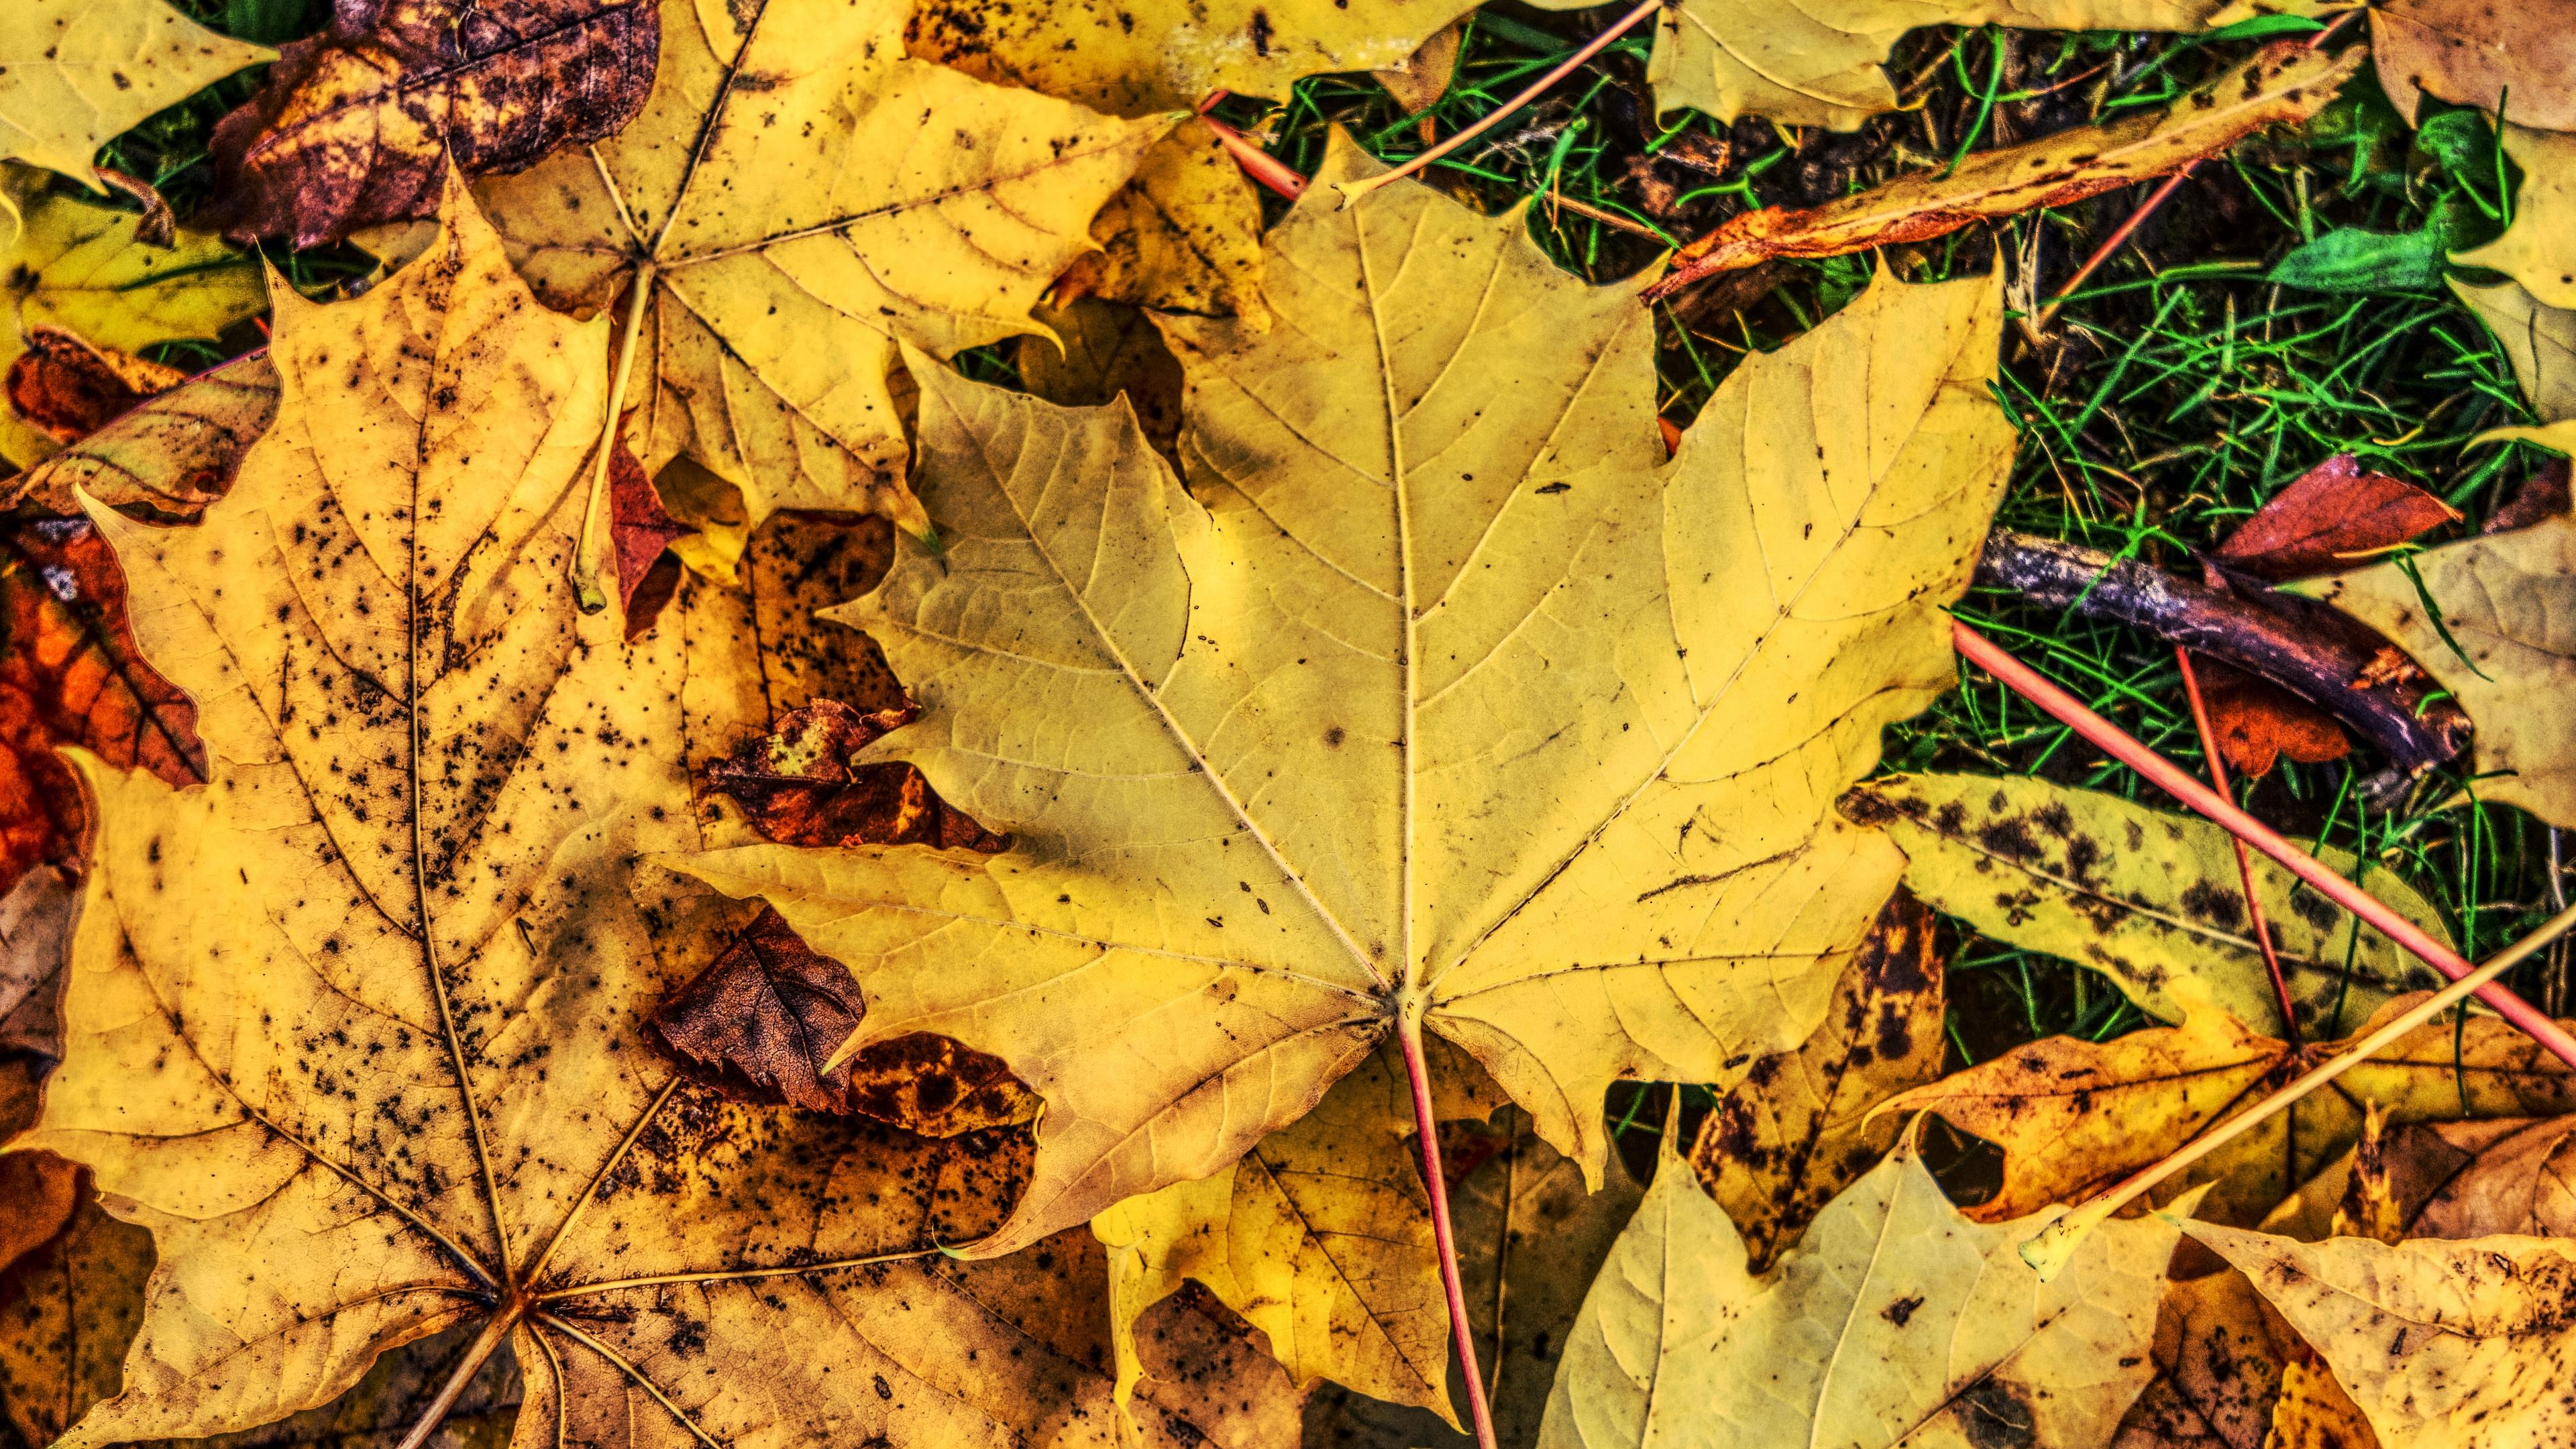 foliage maple autumn fallen 4k 1541117787 - foliage, maple, autumn, fallen 4k - Maple, foliage, Autumn